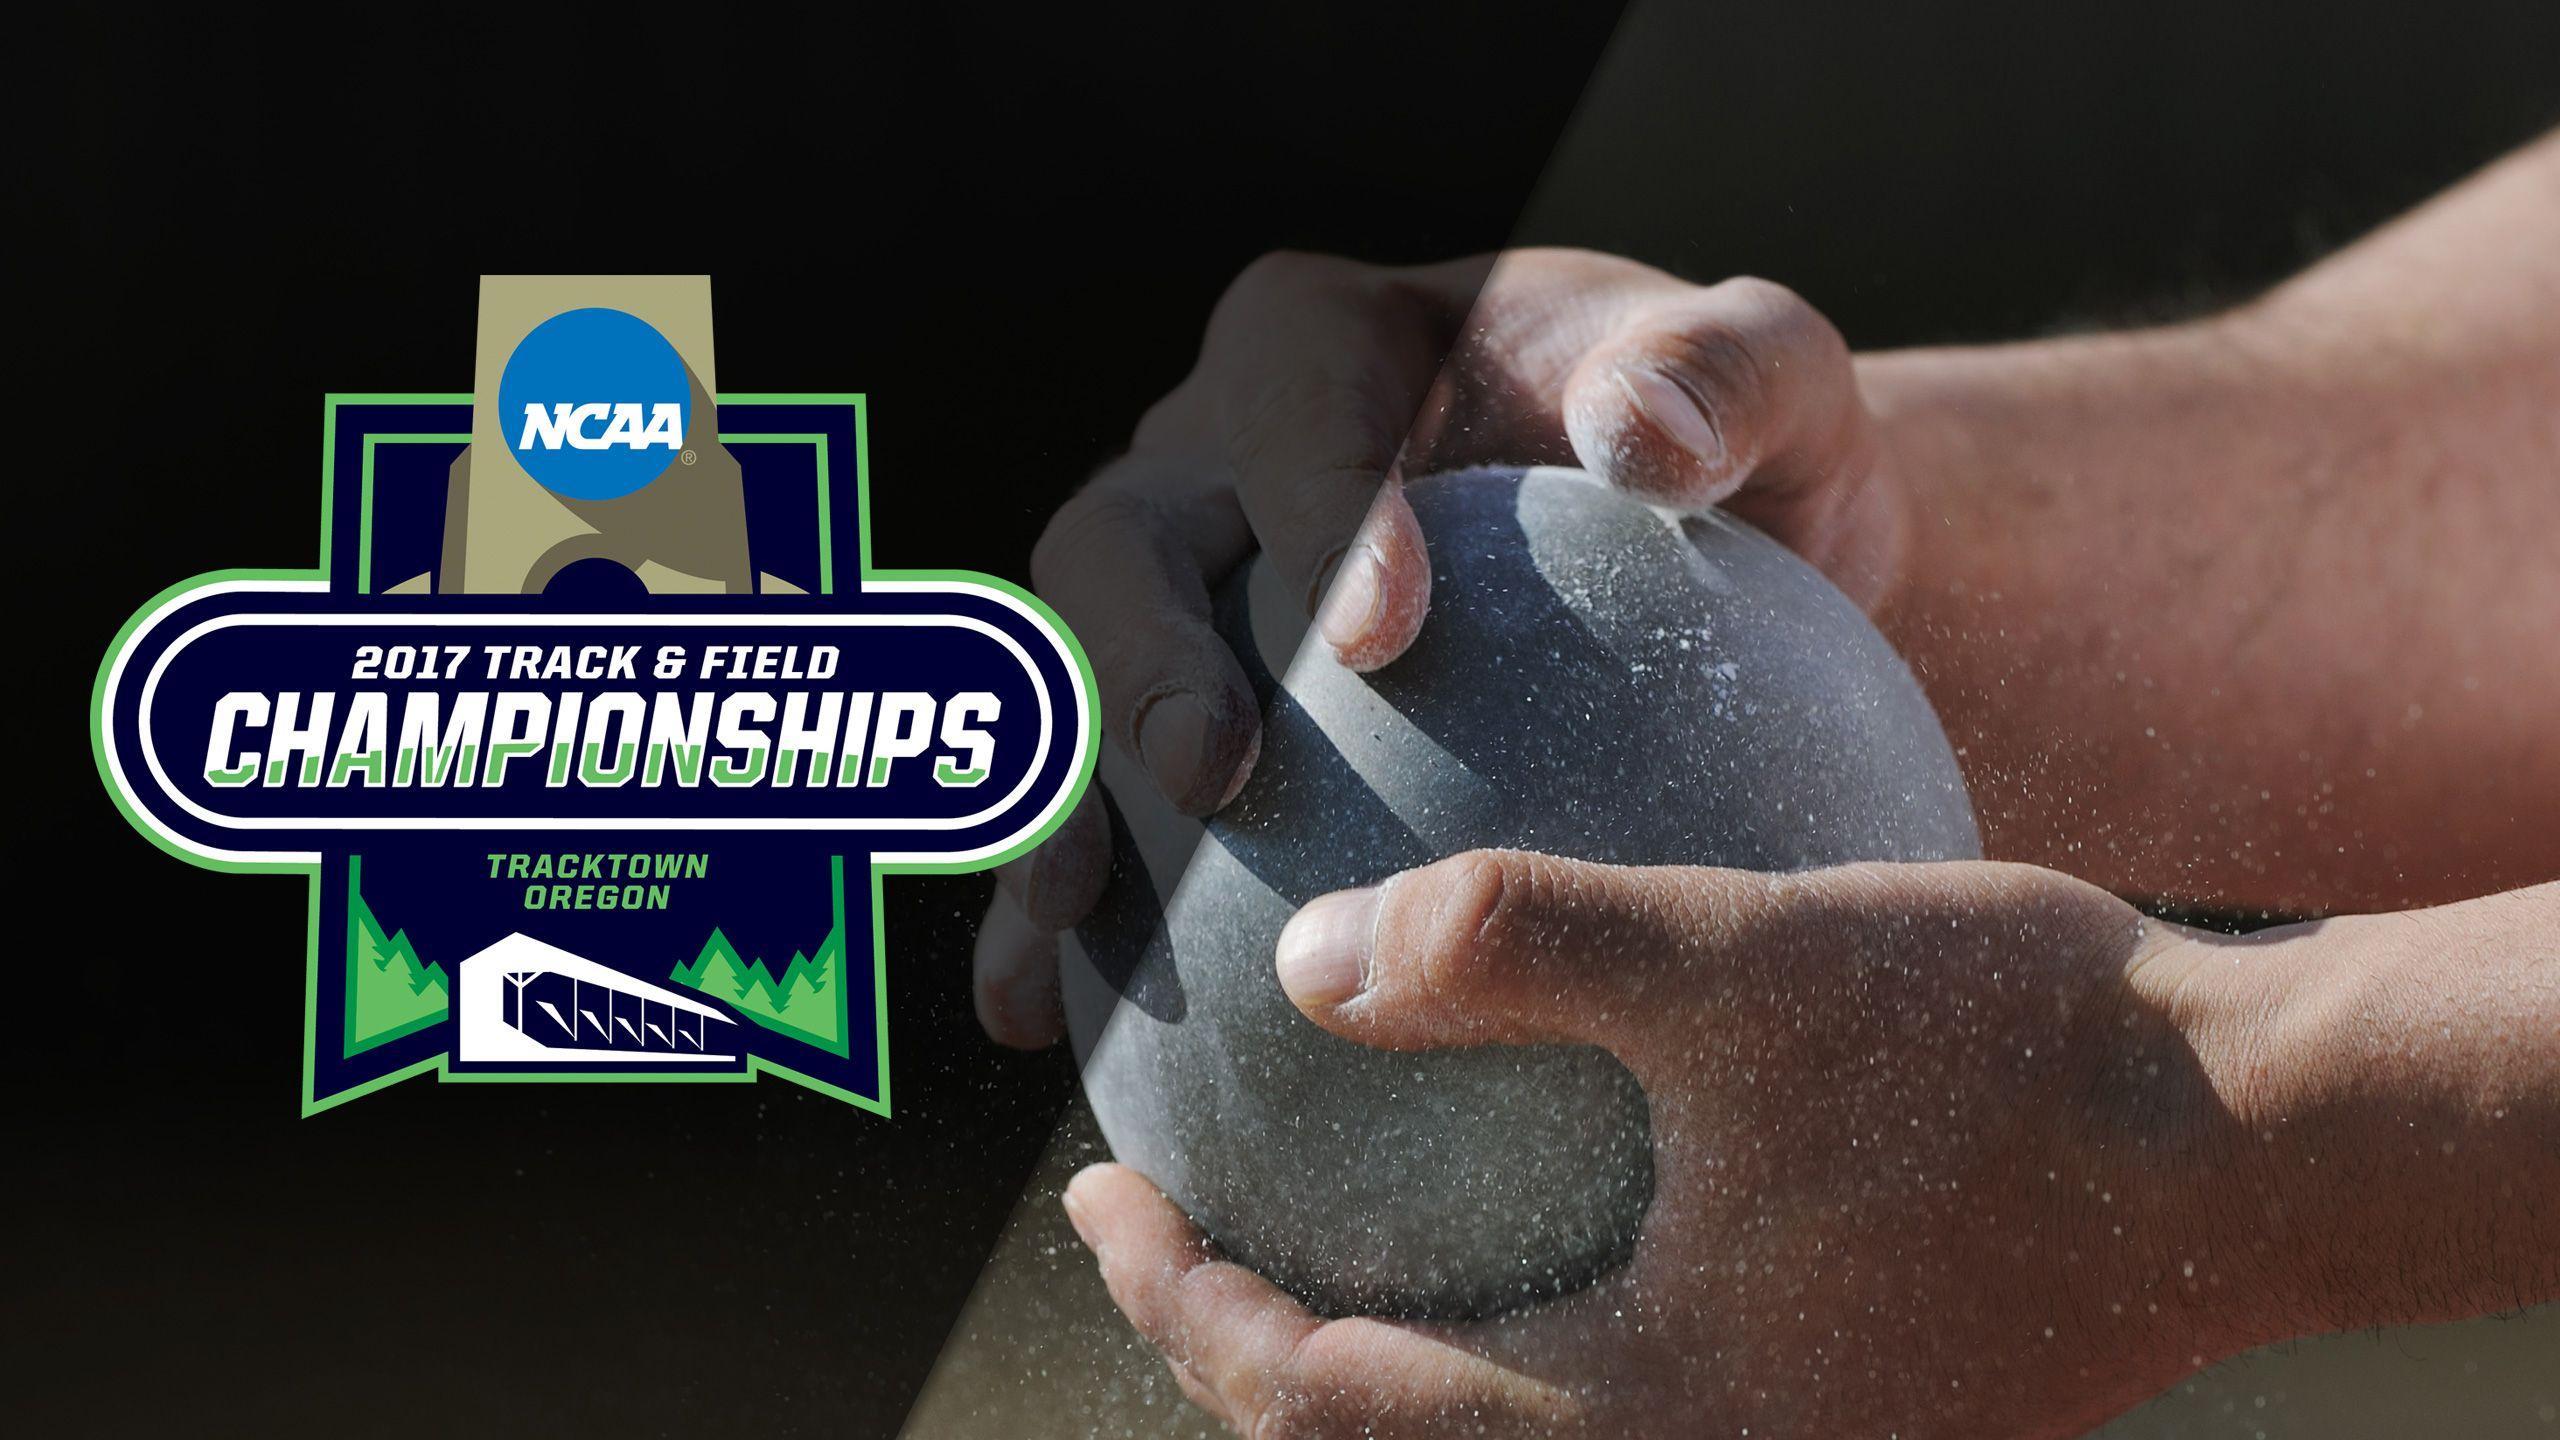 NCAA Track & Field Outdoor Championships - Women's Shot Put Trials (Flight 2) & Final